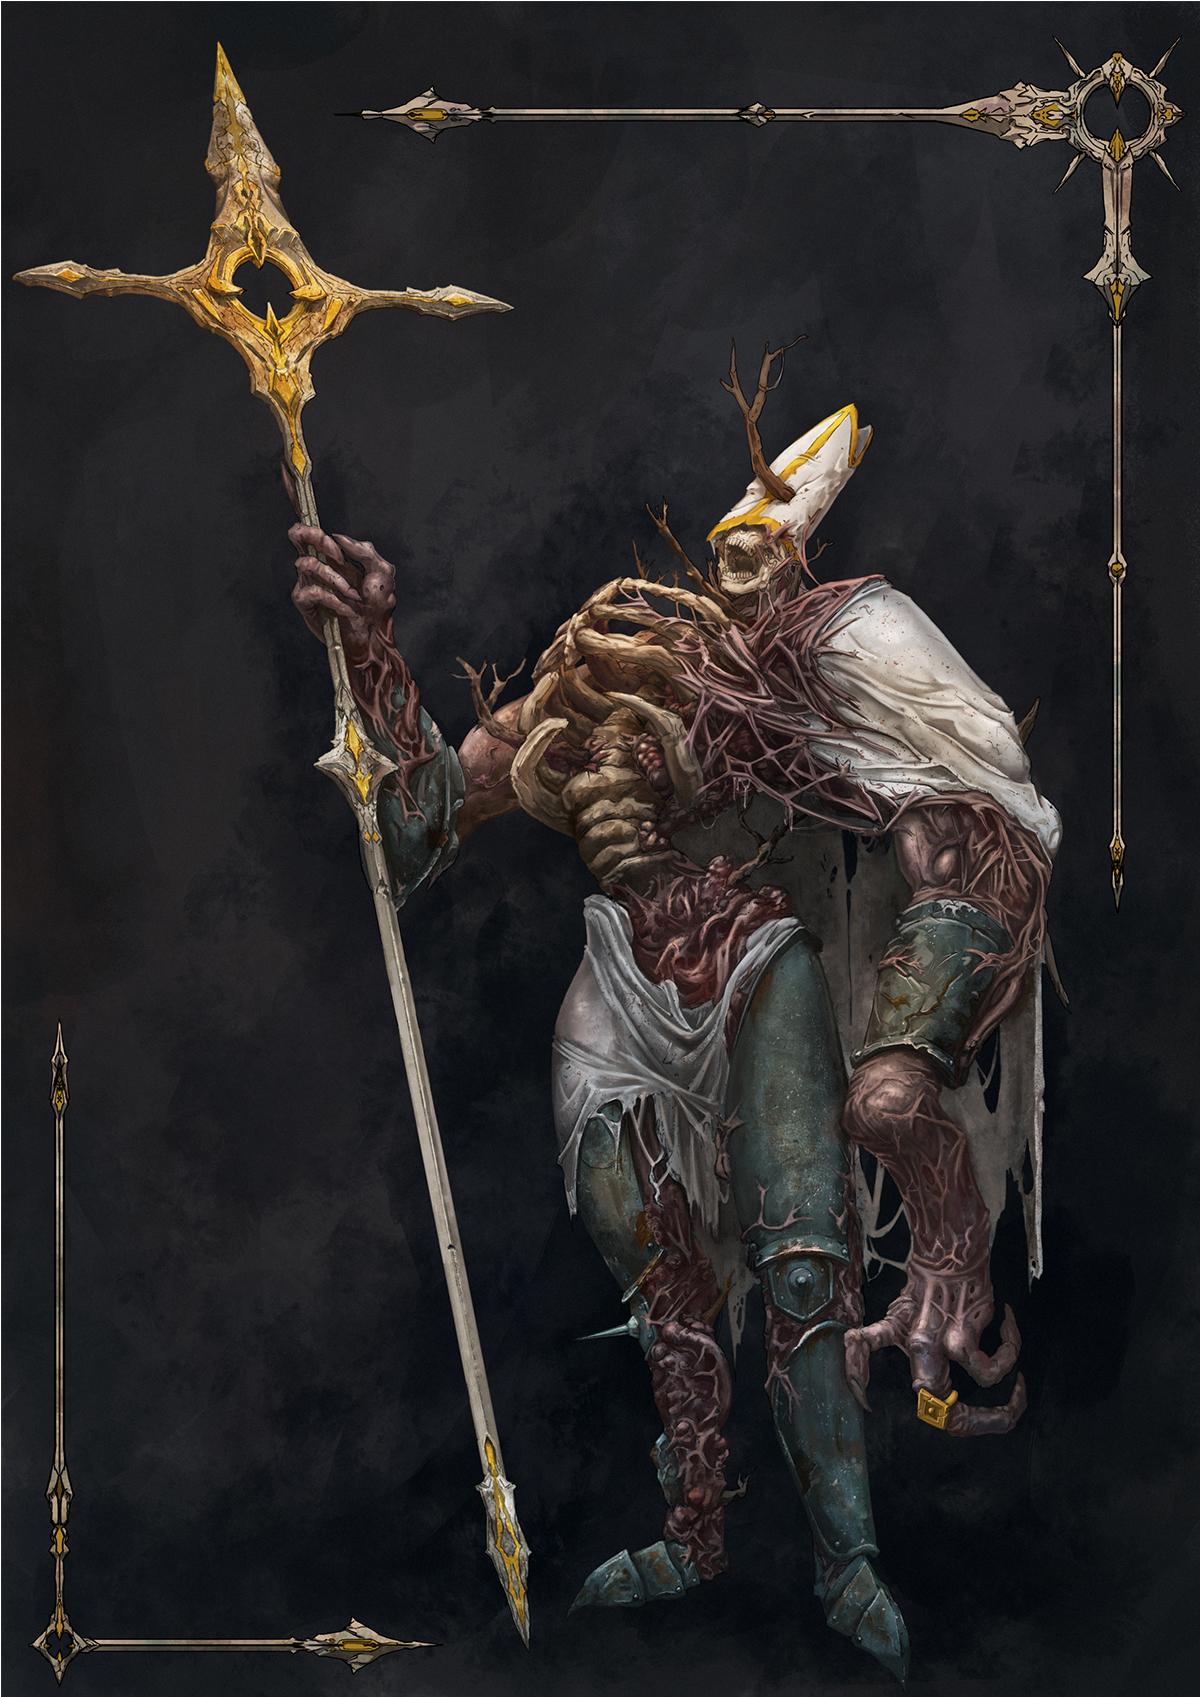 Chekavo monster priest 1 9098fee0 uzxs